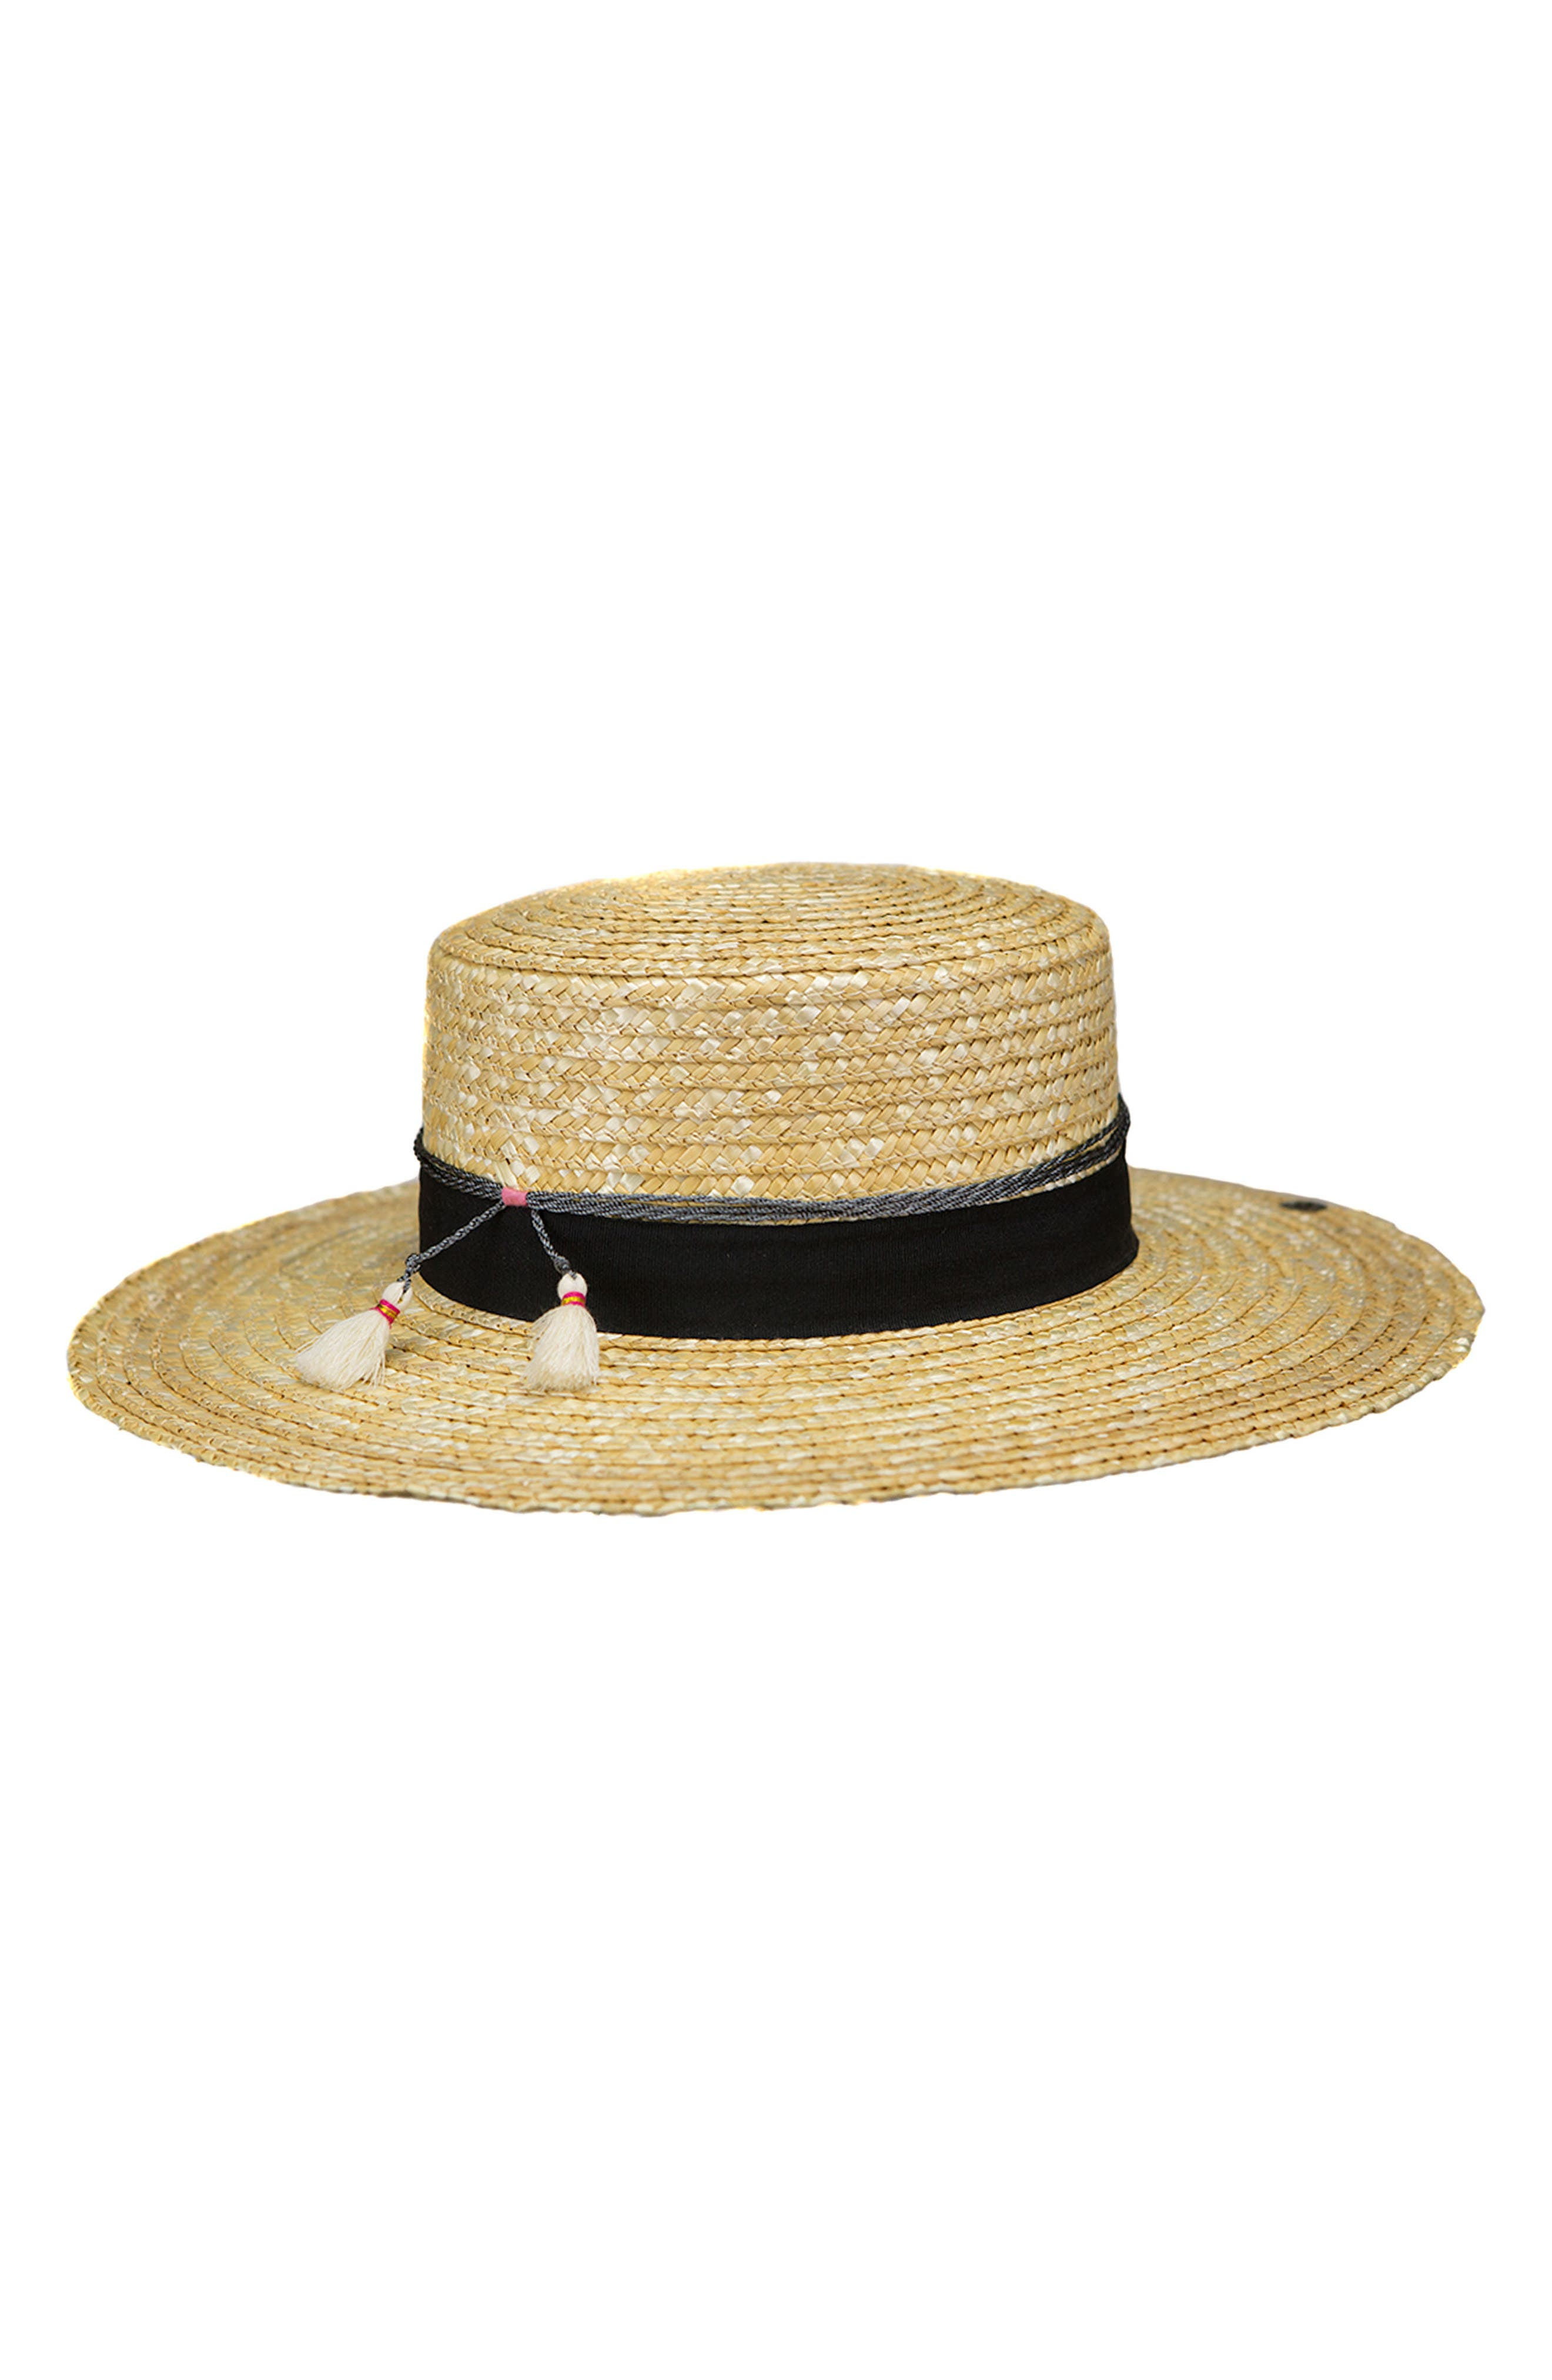 Teresa Wheat Straw Resort Hat,                             Main thumbnail 1, color,                             NATURAL